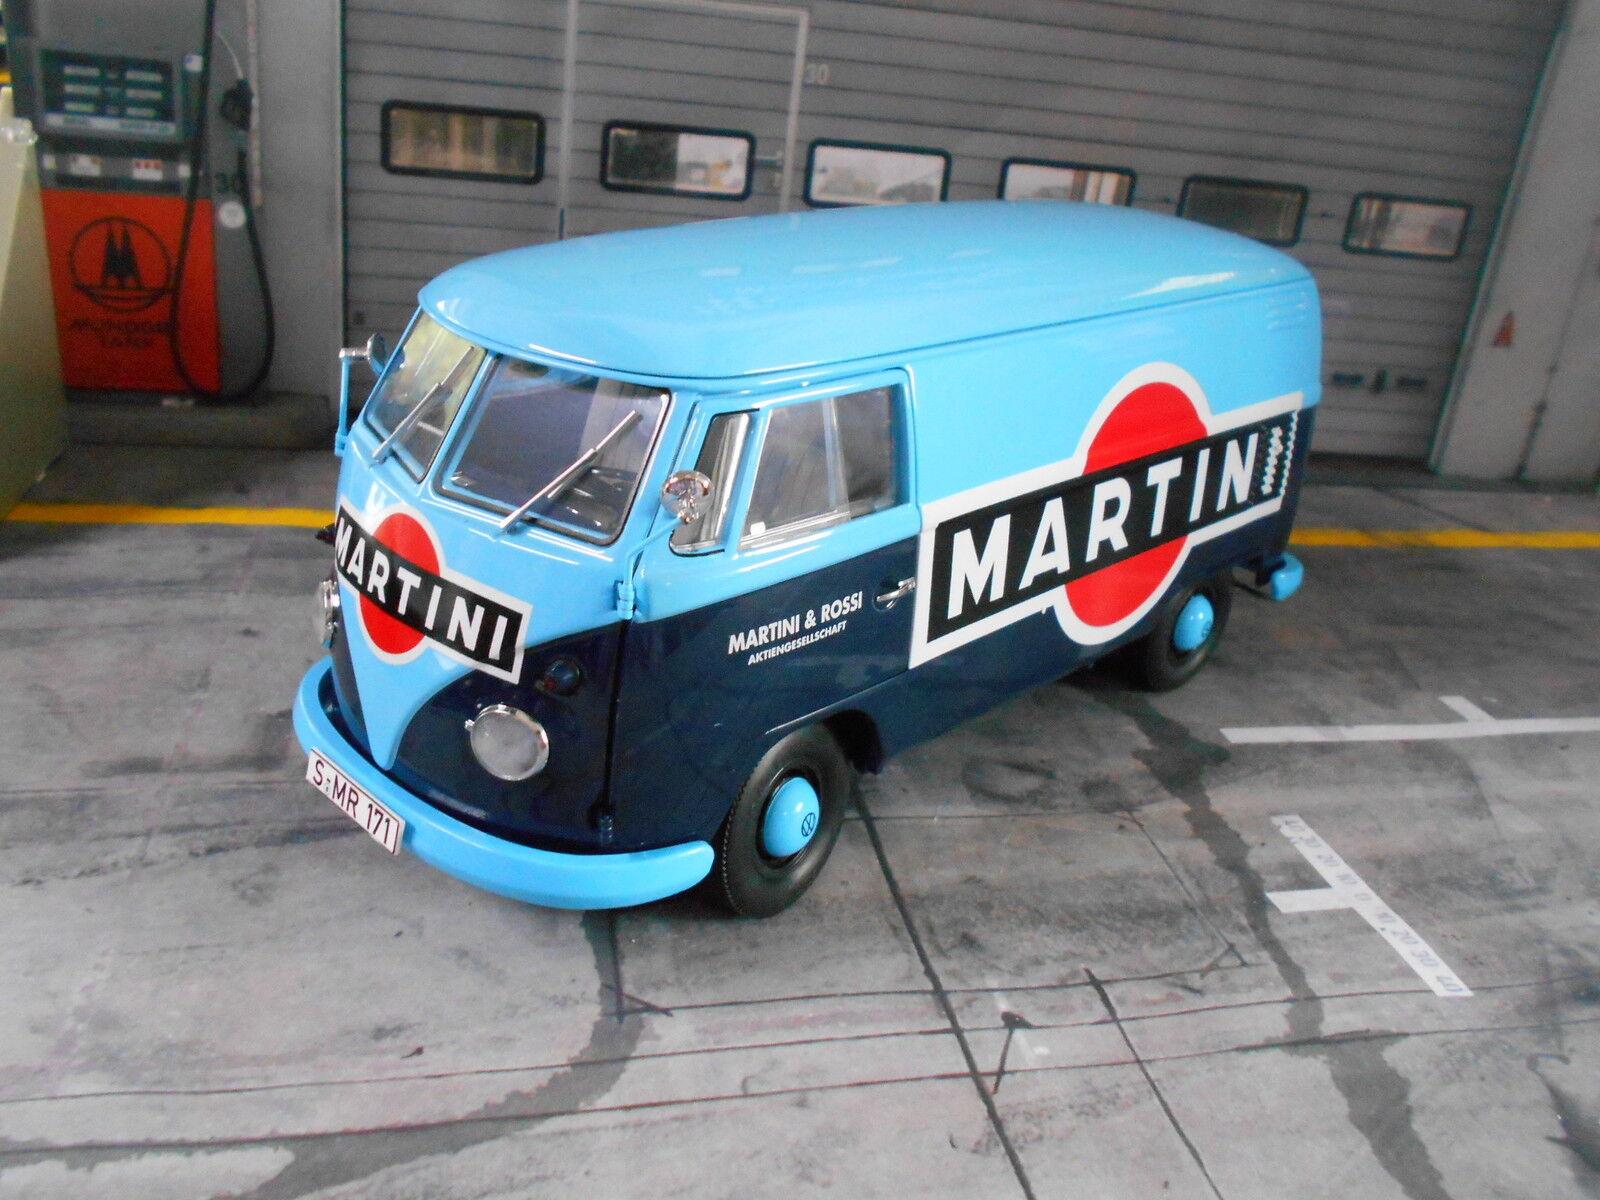 Volkswagen vw bus t1b 1 B Fourgon Martini Bleu bleu 1959 - 1963 schuco 1 18